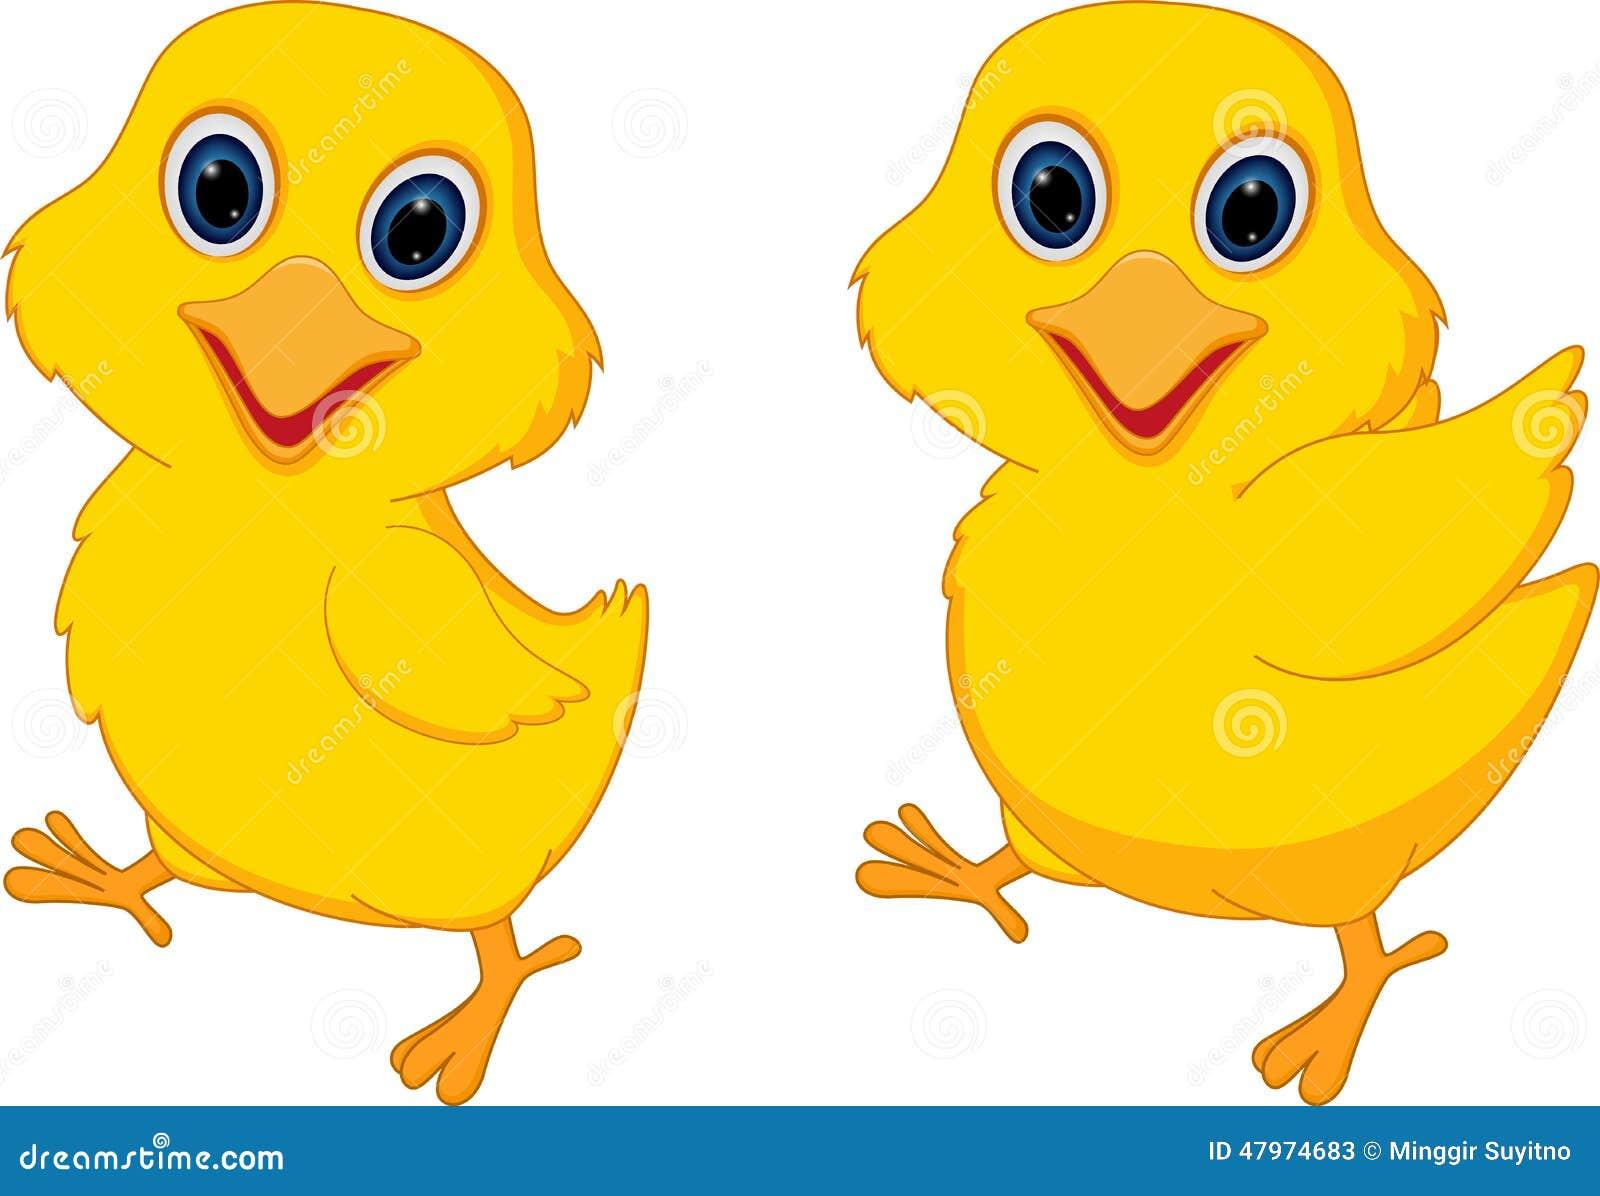 Happy chick cartoon stock vector  Illustration of chick - 47974683